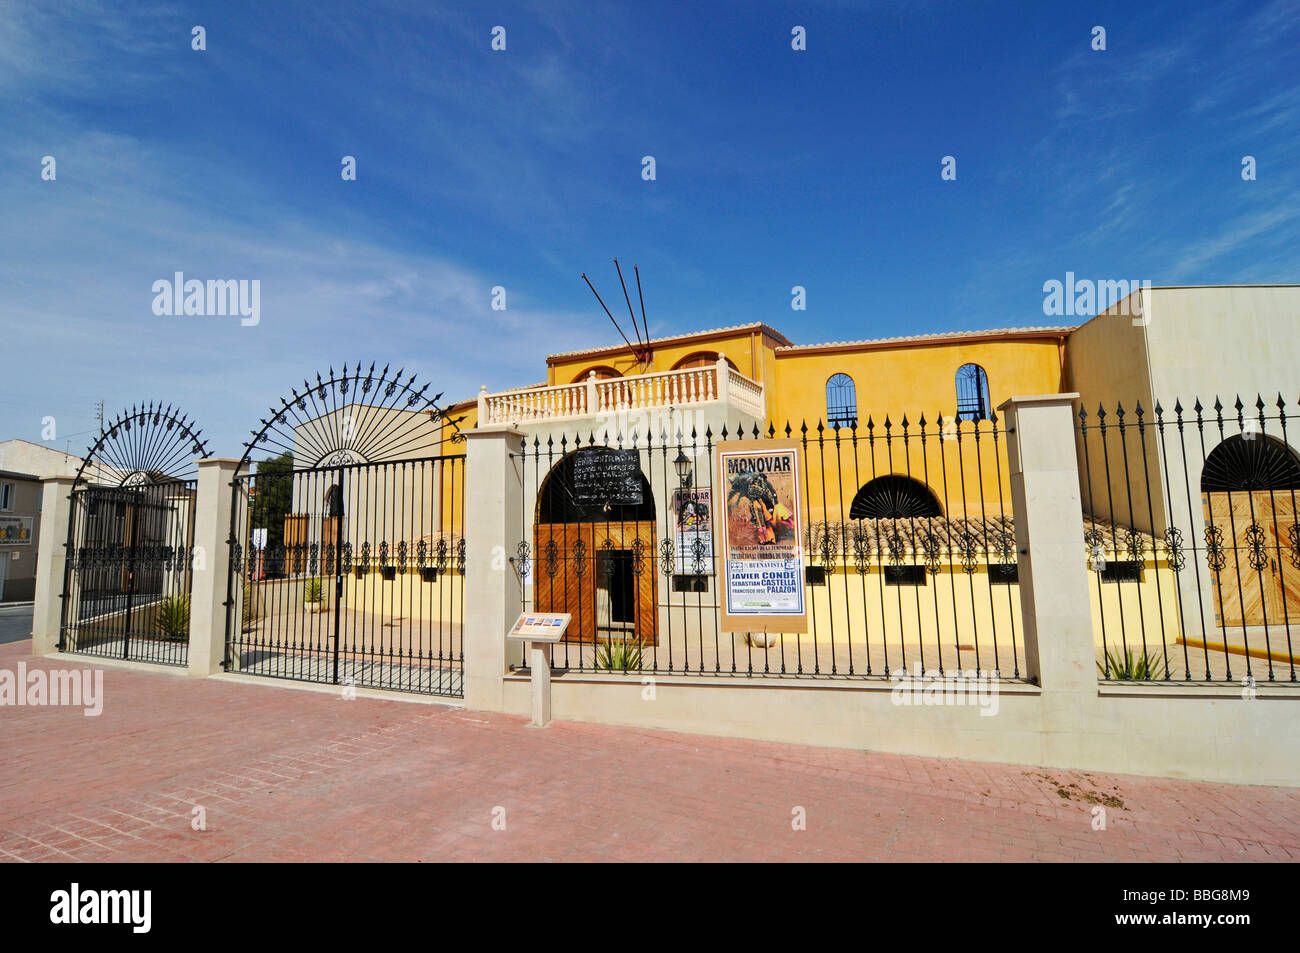 Bullring, bullfighting, arena, Monovar, Alicante, Spain, Europe Stock Photo